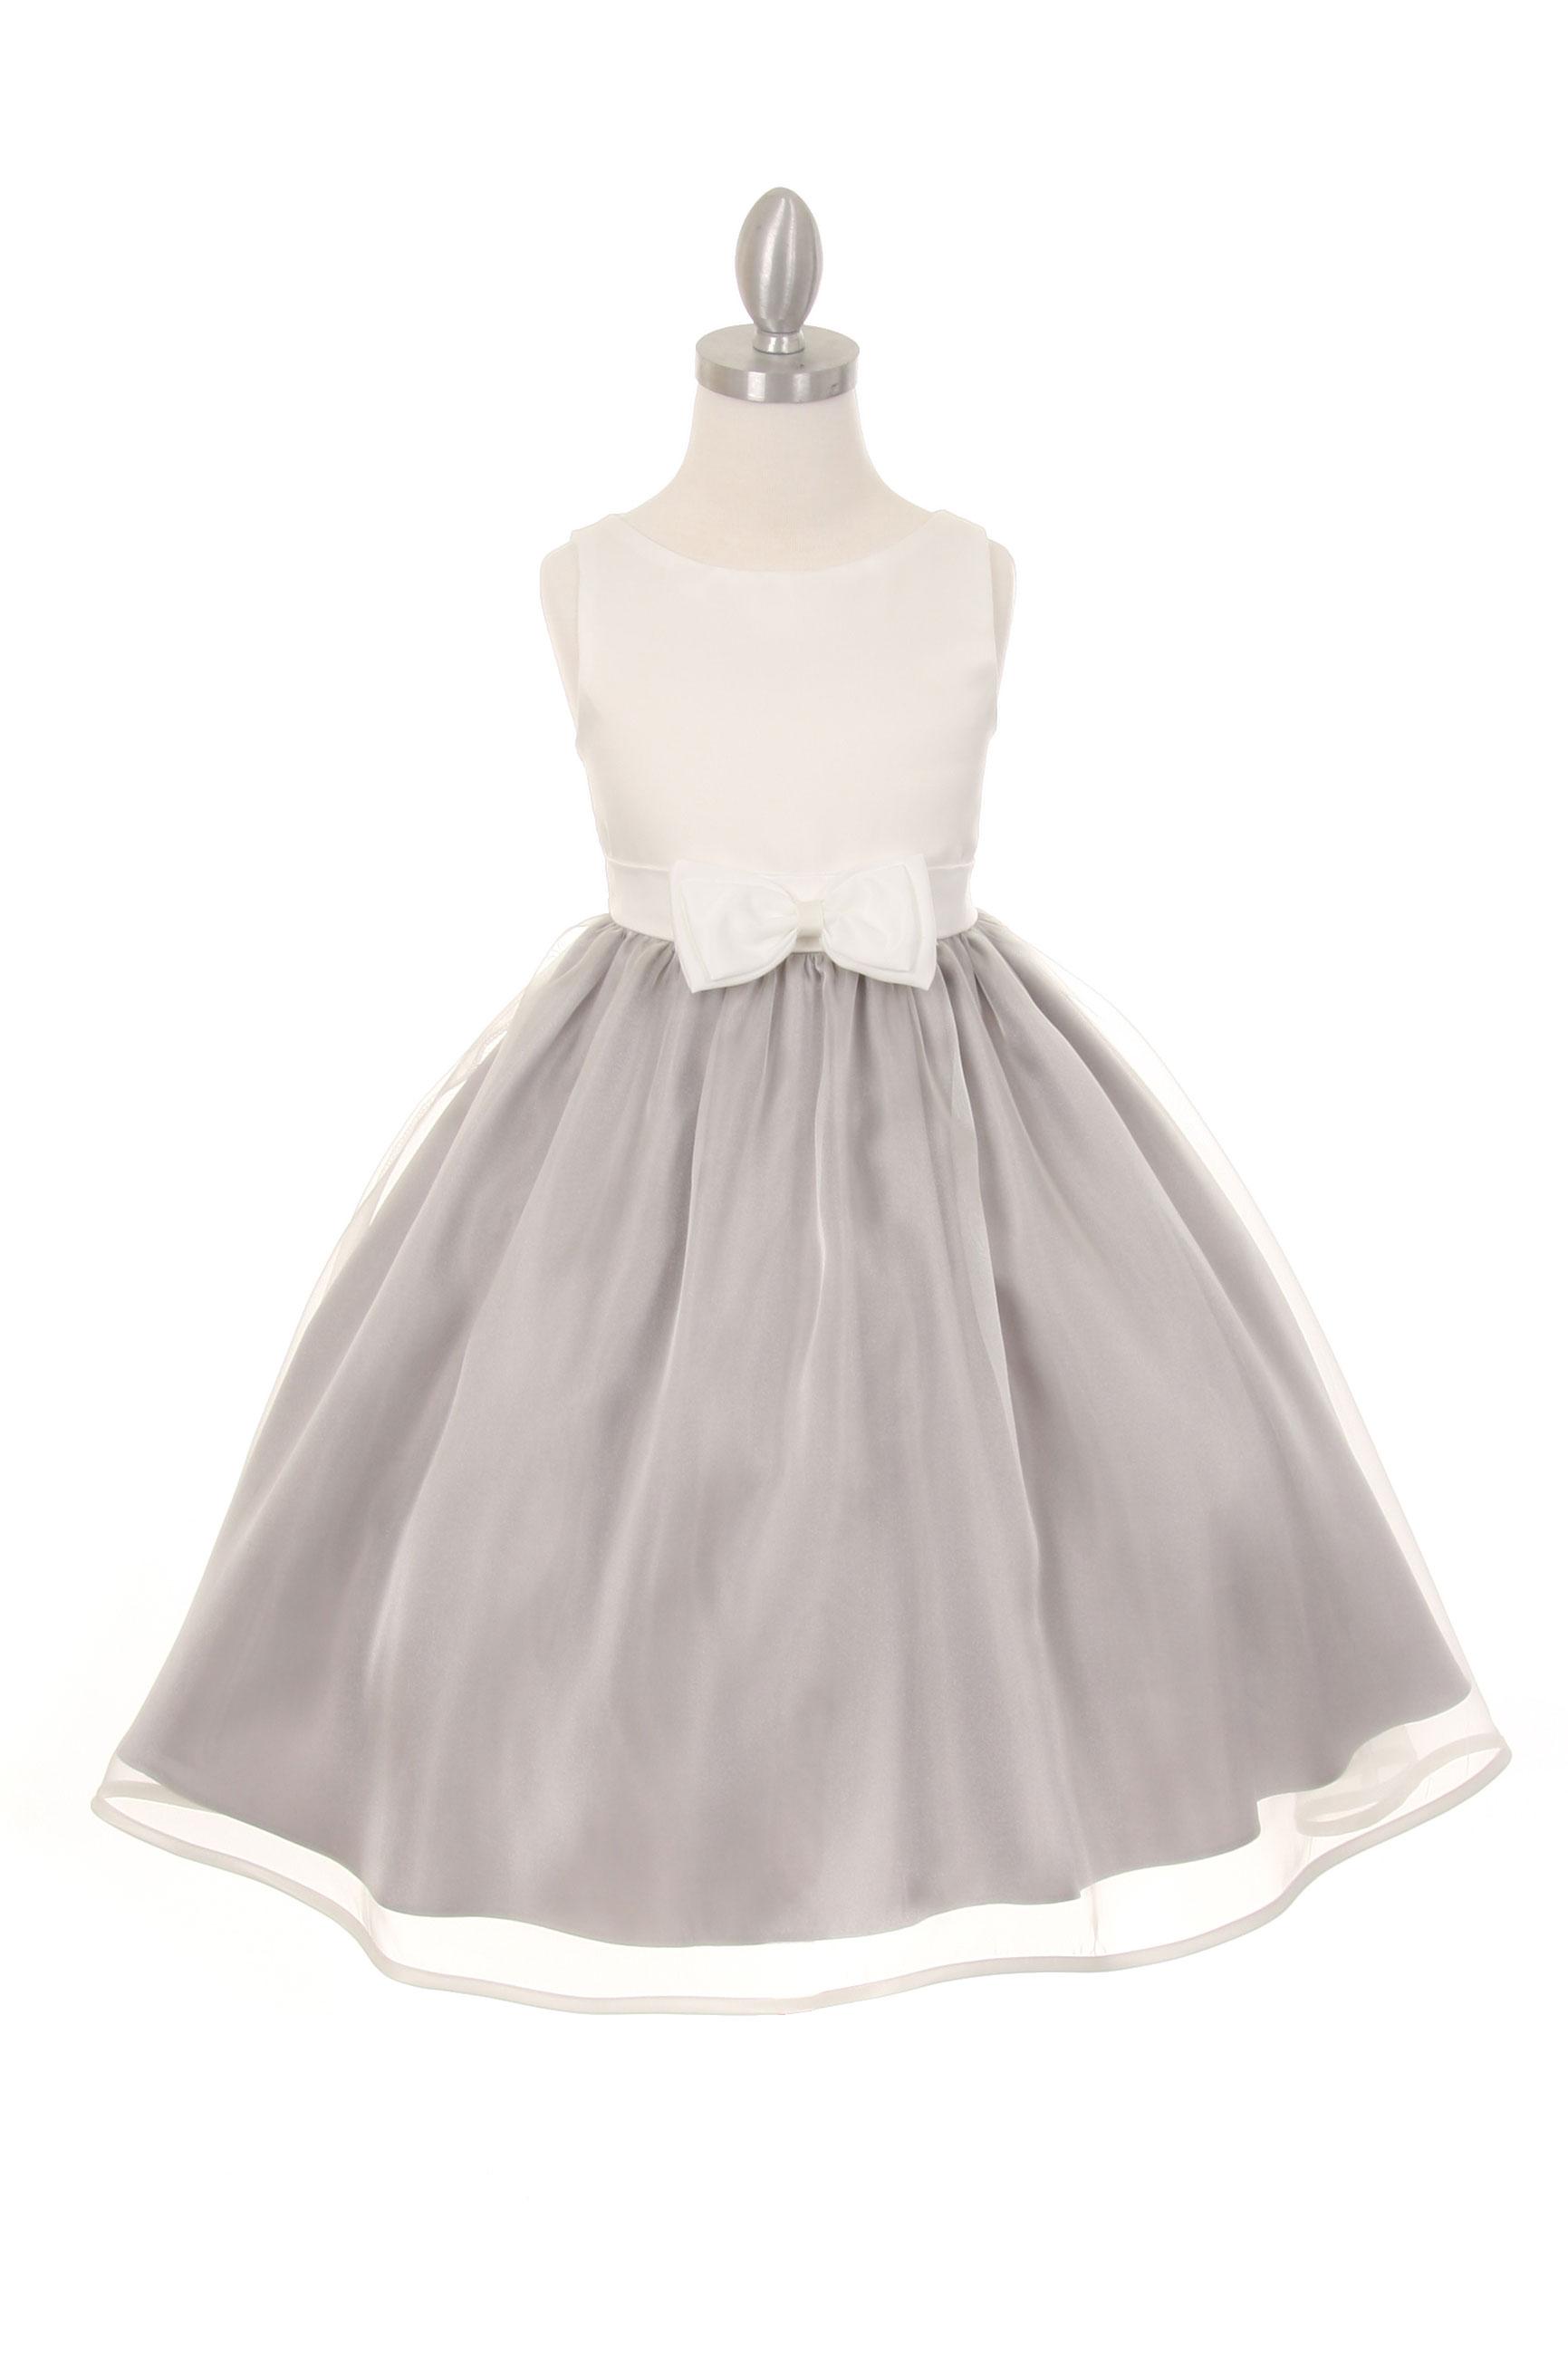 CC 1182IVSV Girls Dress Style 1182 Sleeveless Organza Dress with Front Bo